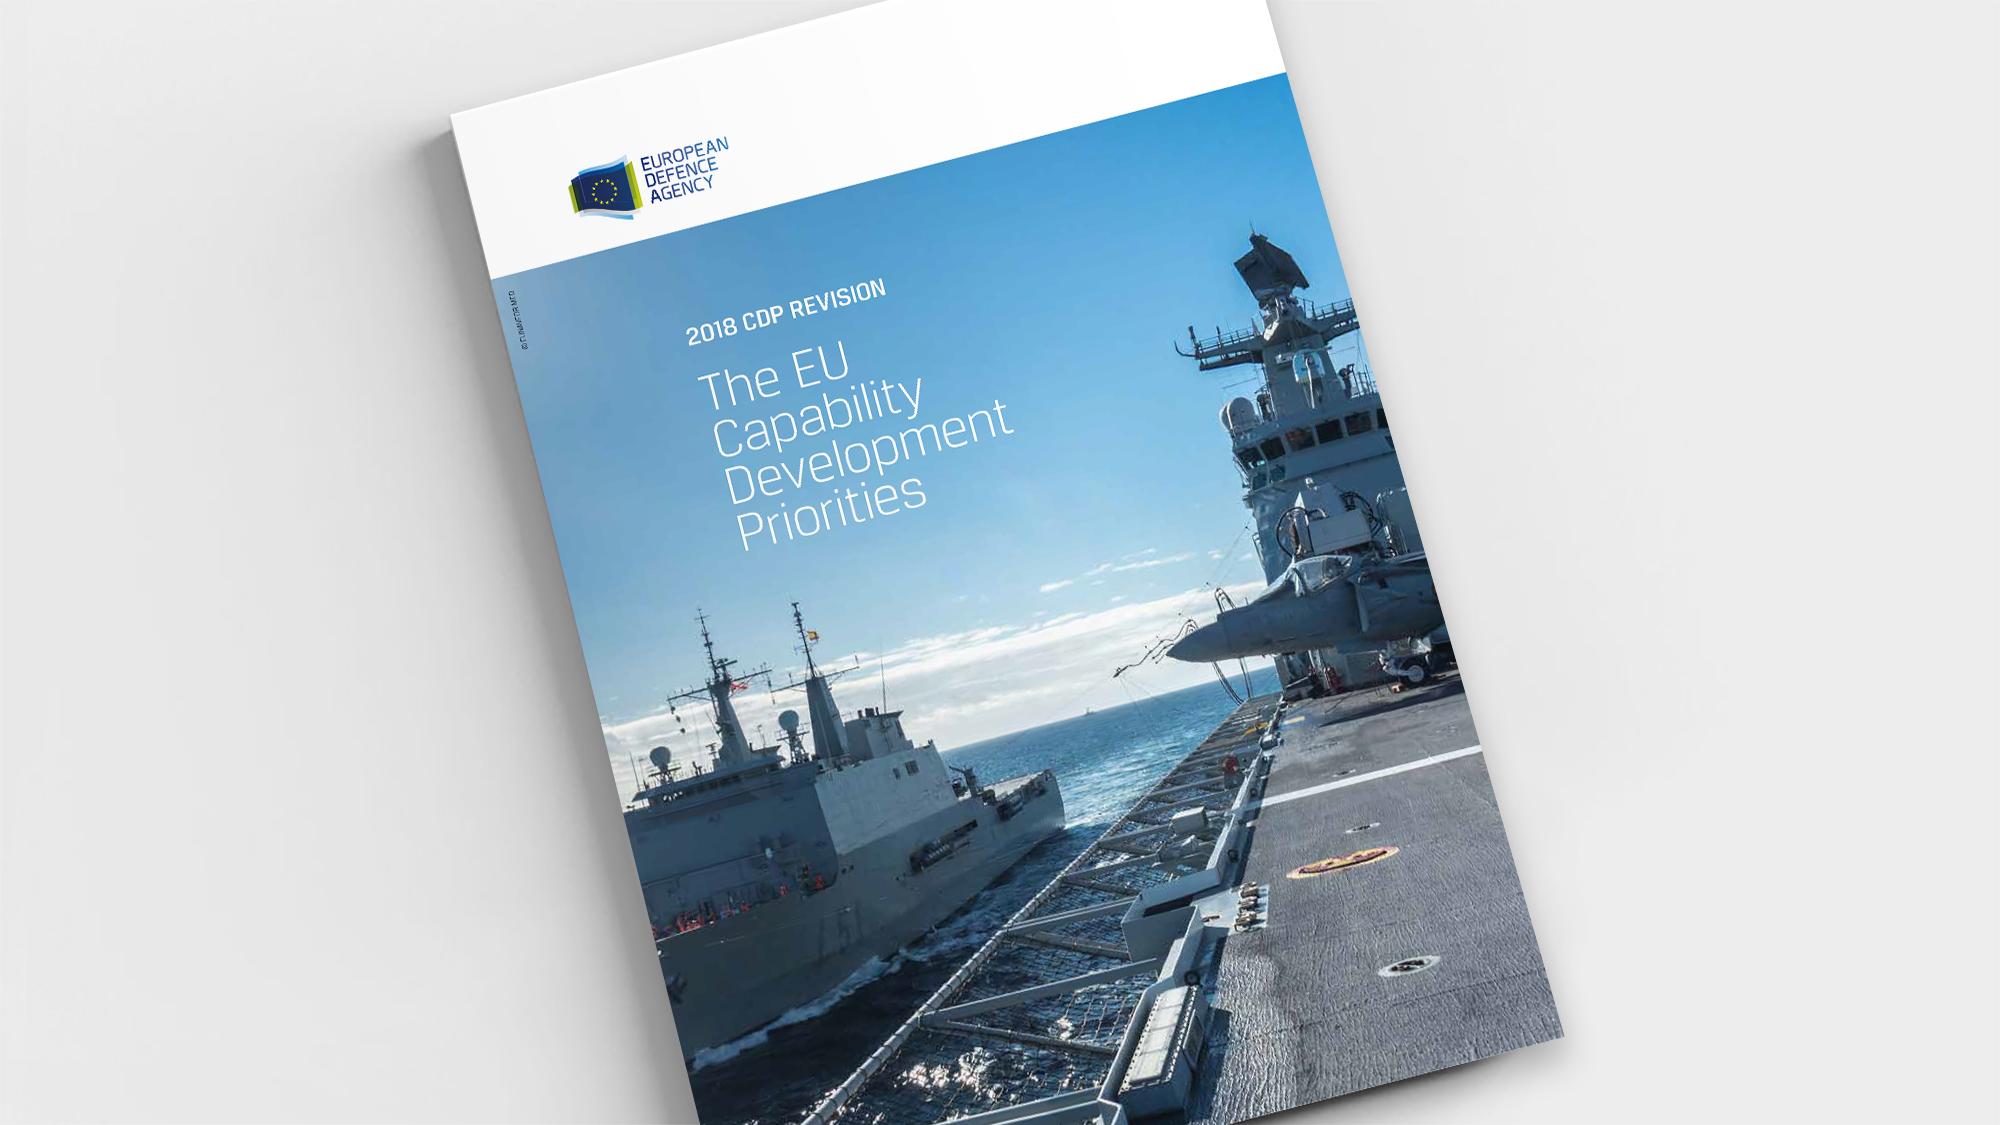 The EU Capability Development Priorities